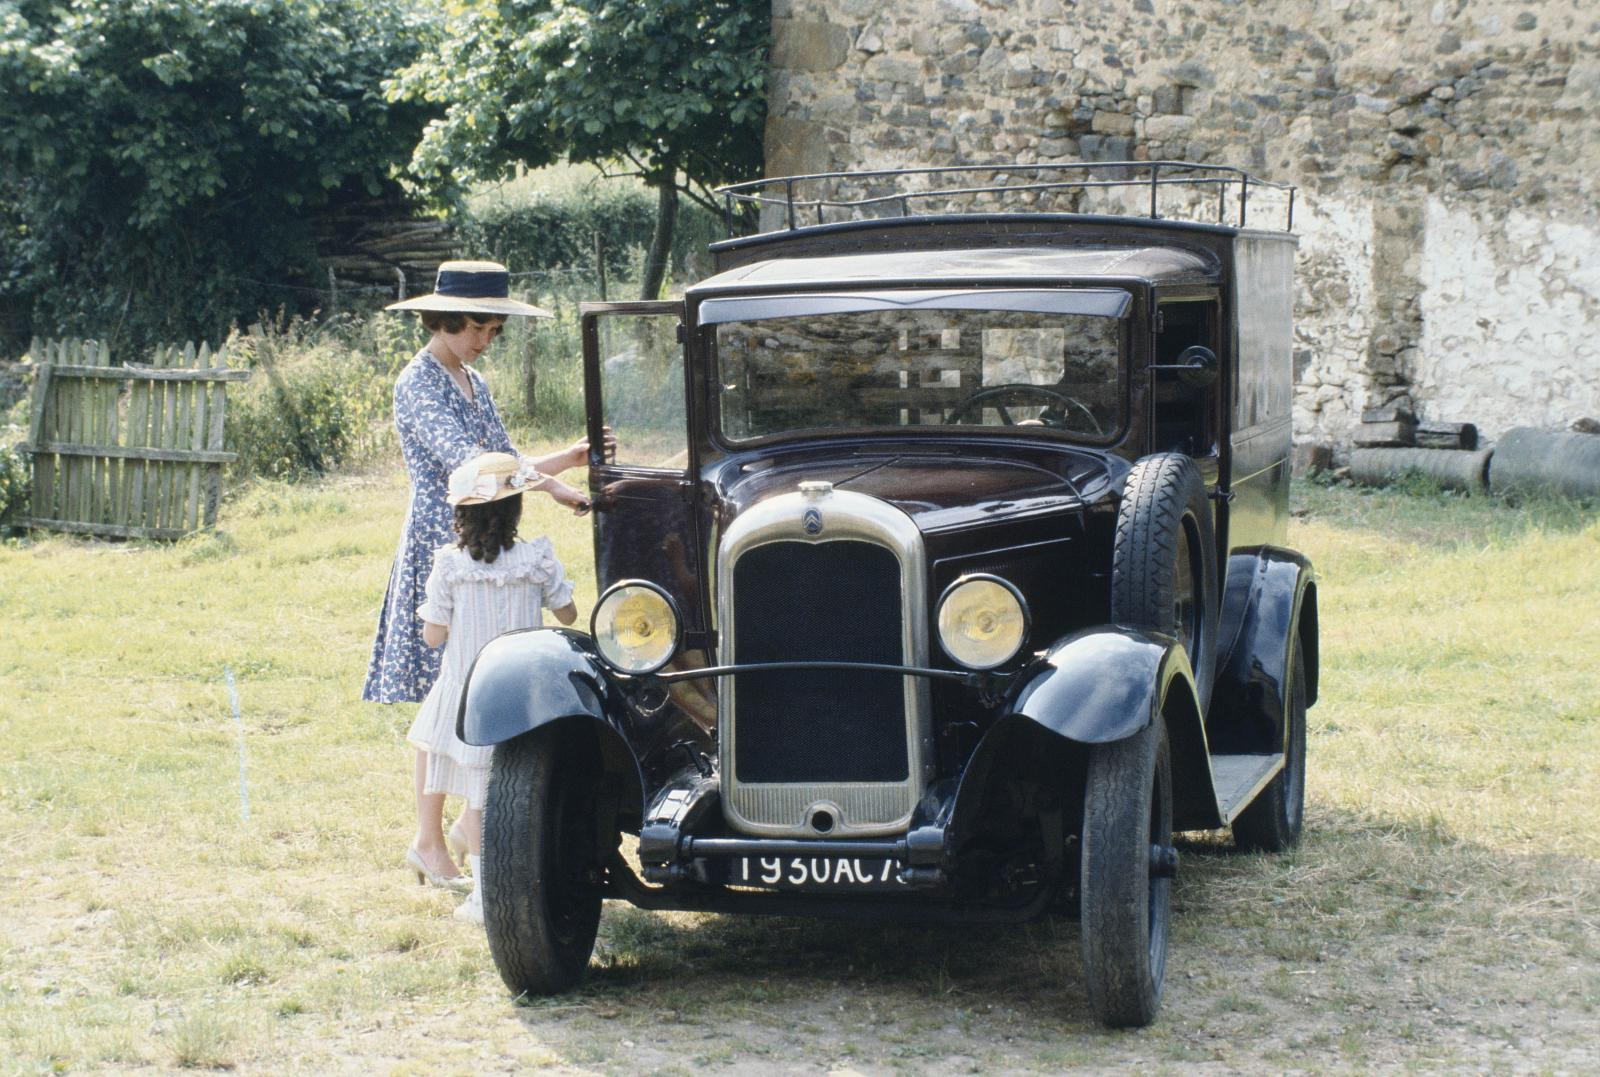 C4 Fourgon - 1930